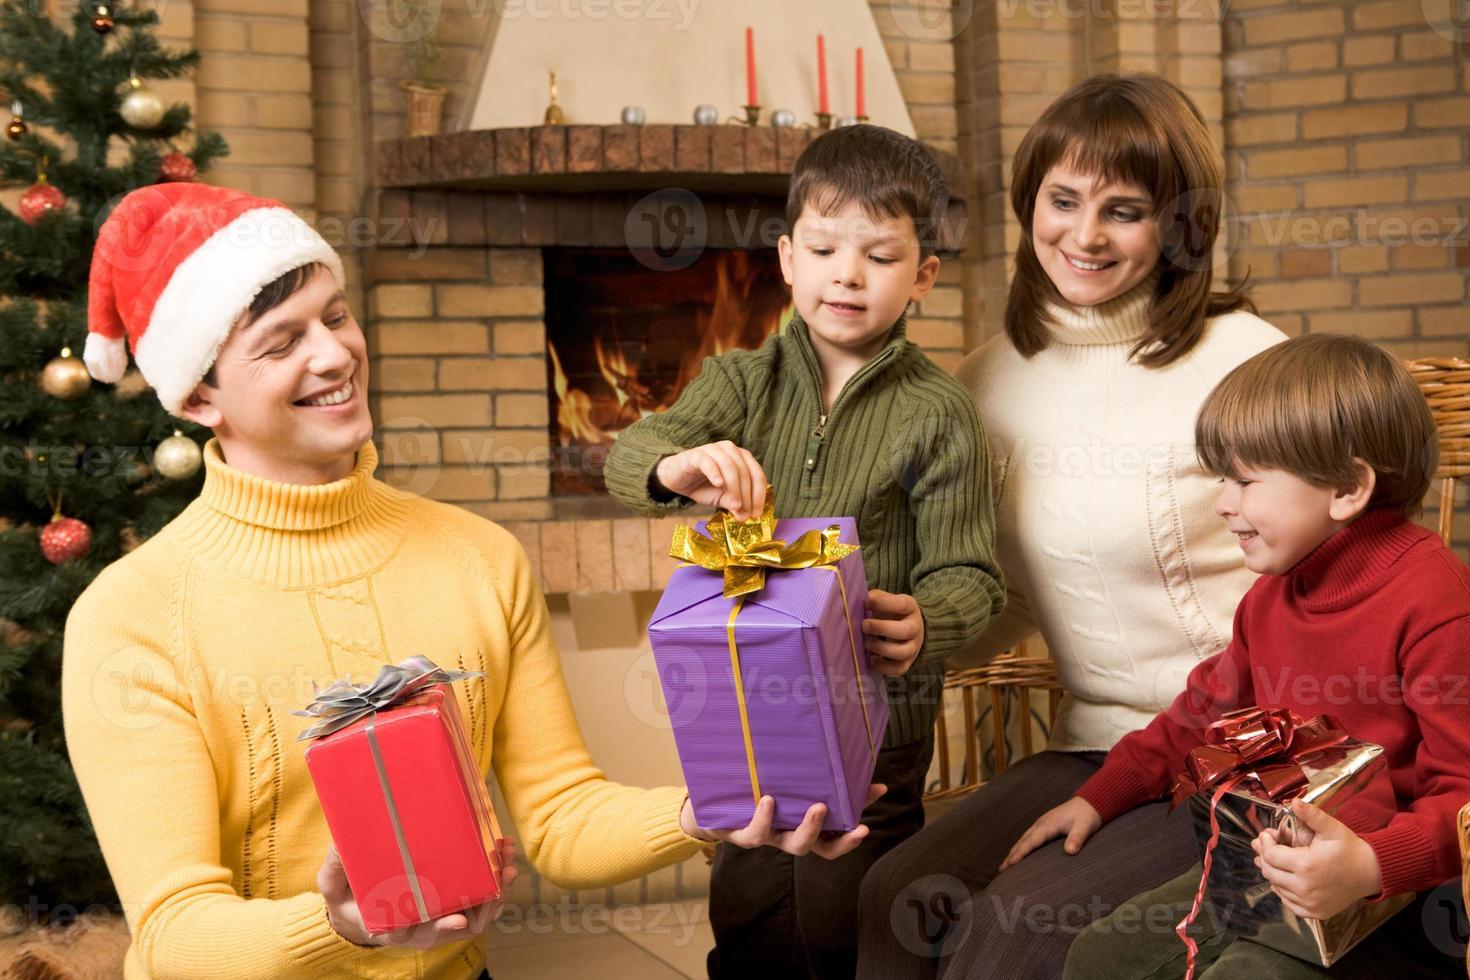 Familienurlaub foto